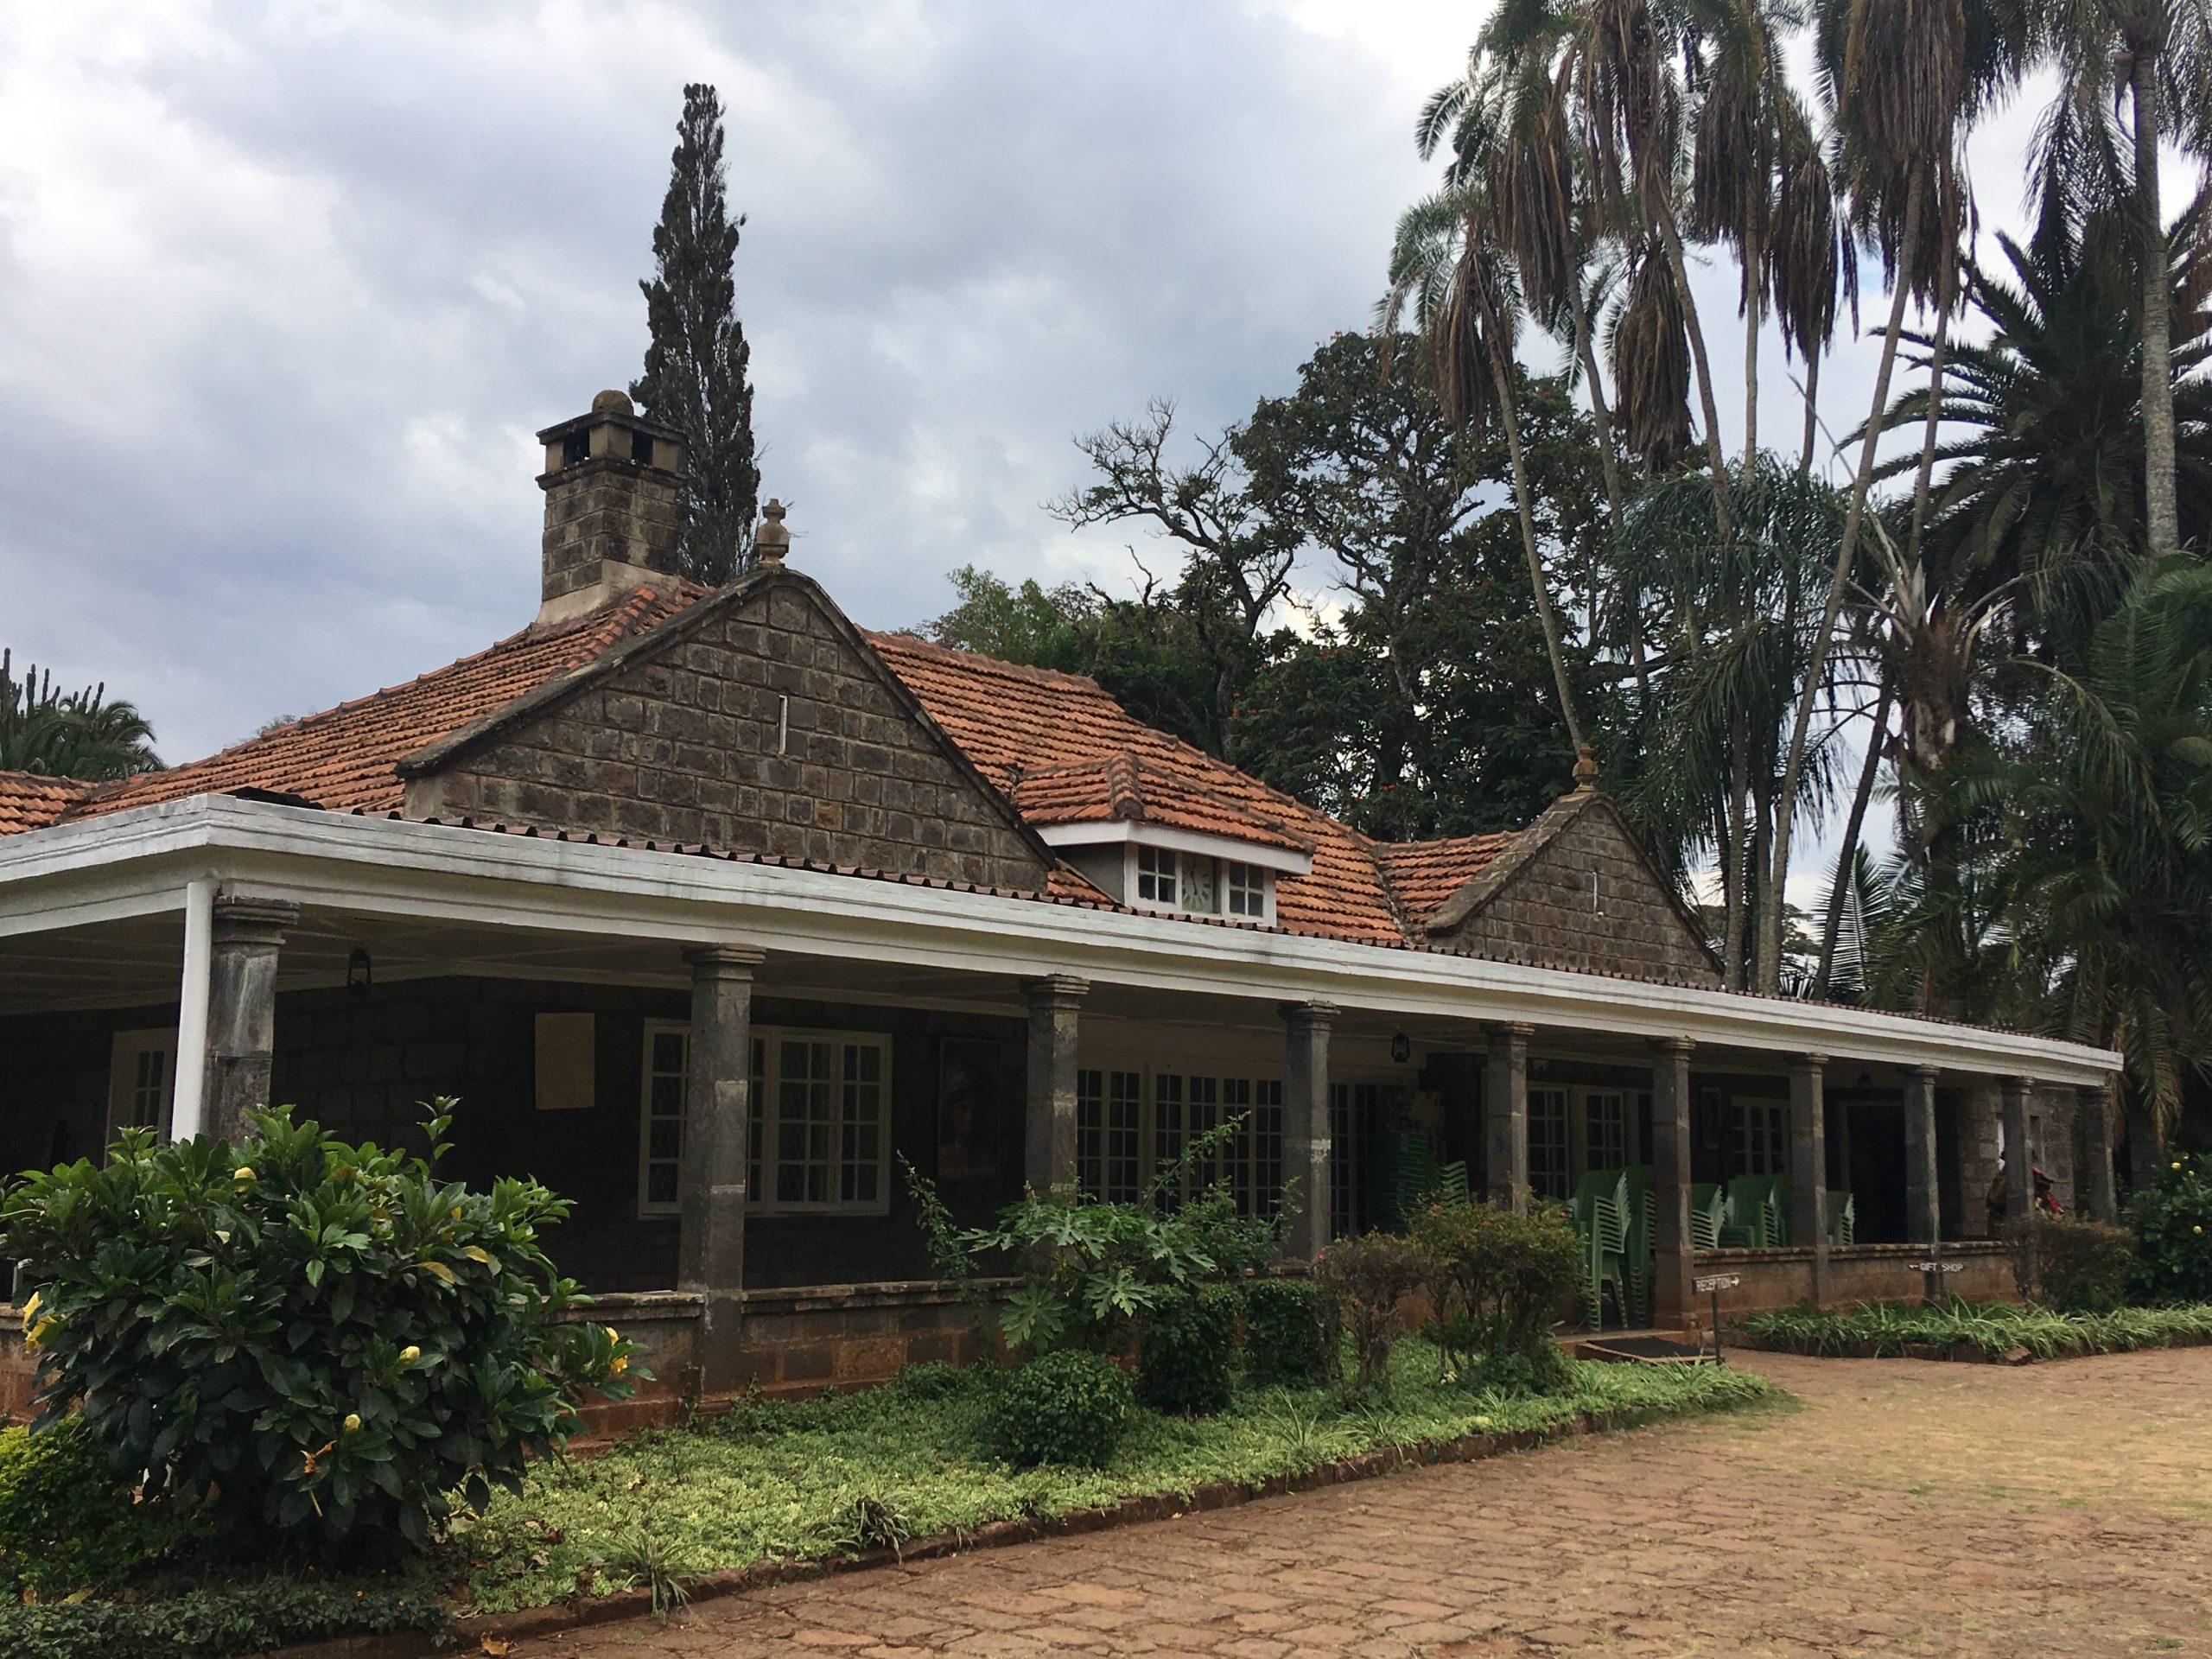 Kenya: Karen and the Ngong Hills